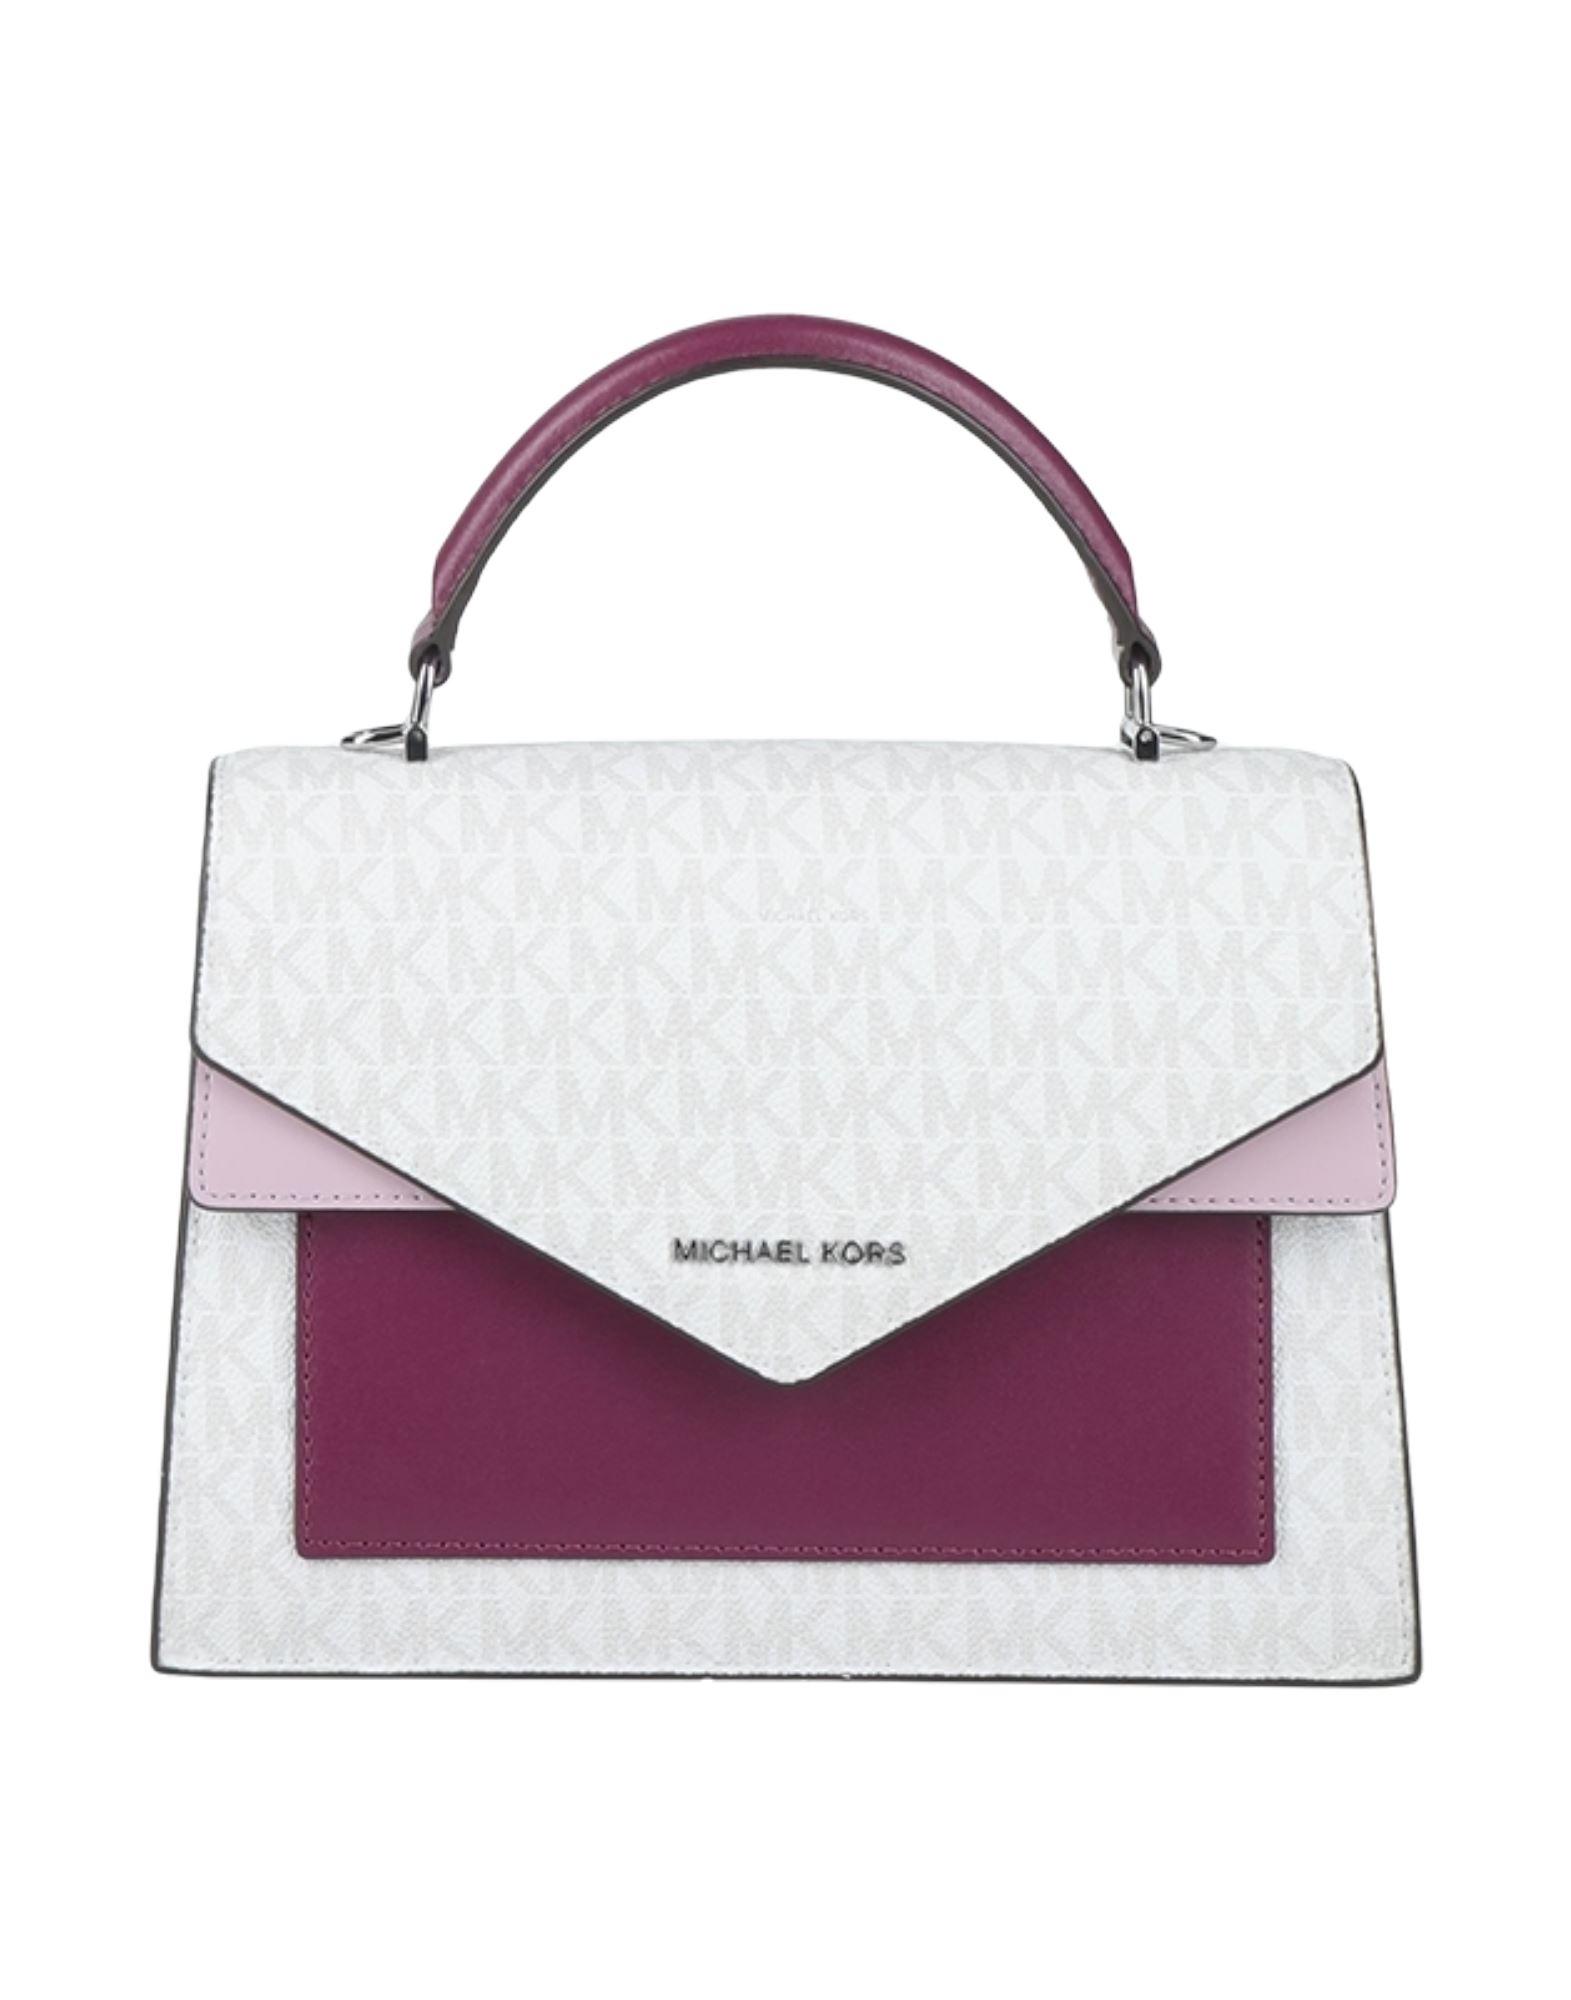 MICHAEL MICHAEL KORS Handbags - Item 45574857